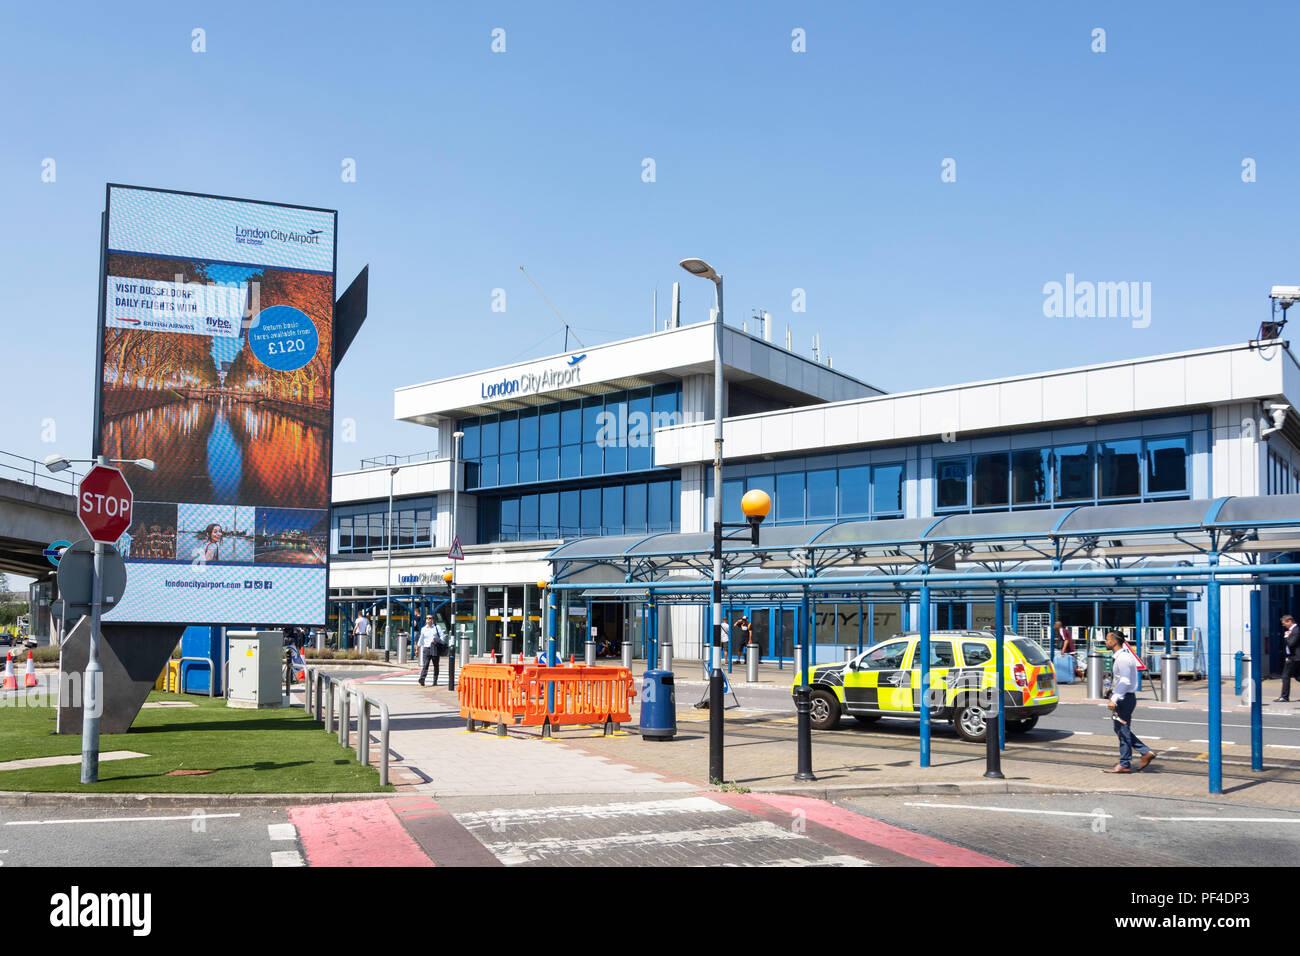 Main entrance, London City Airport, Silvertown, London Borough of Newham, Greater London, England, United Kingdom - Stock Image